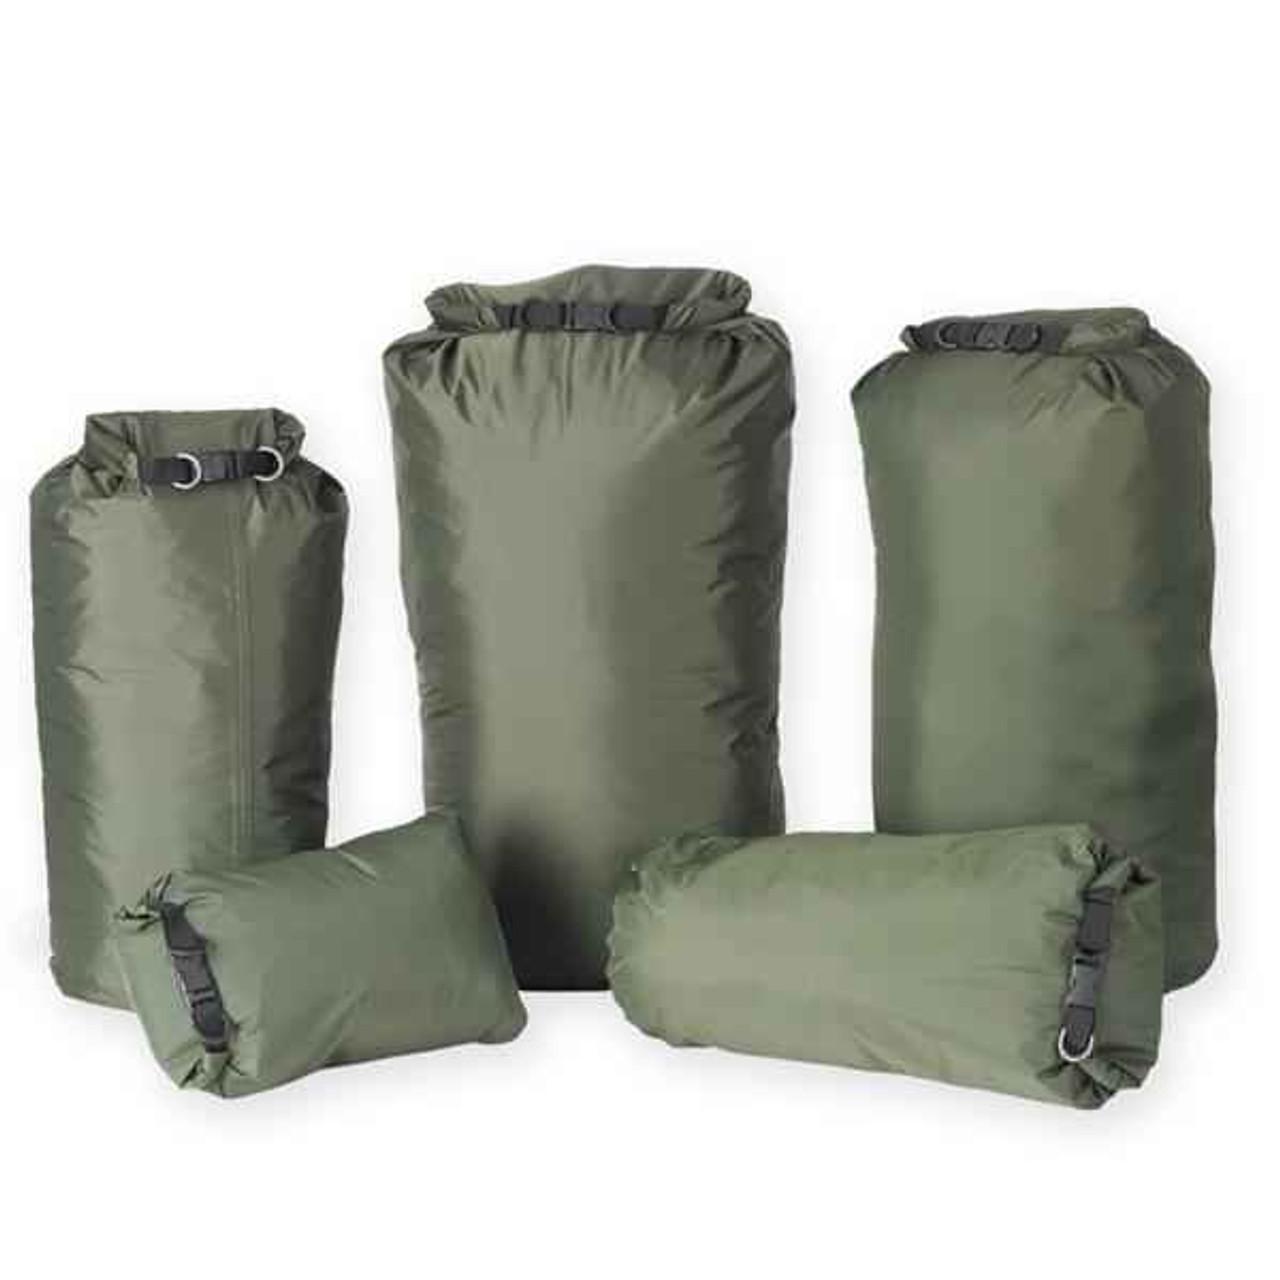 Pro Force Dri-Sak Waterproof Bag - X Large, Olive